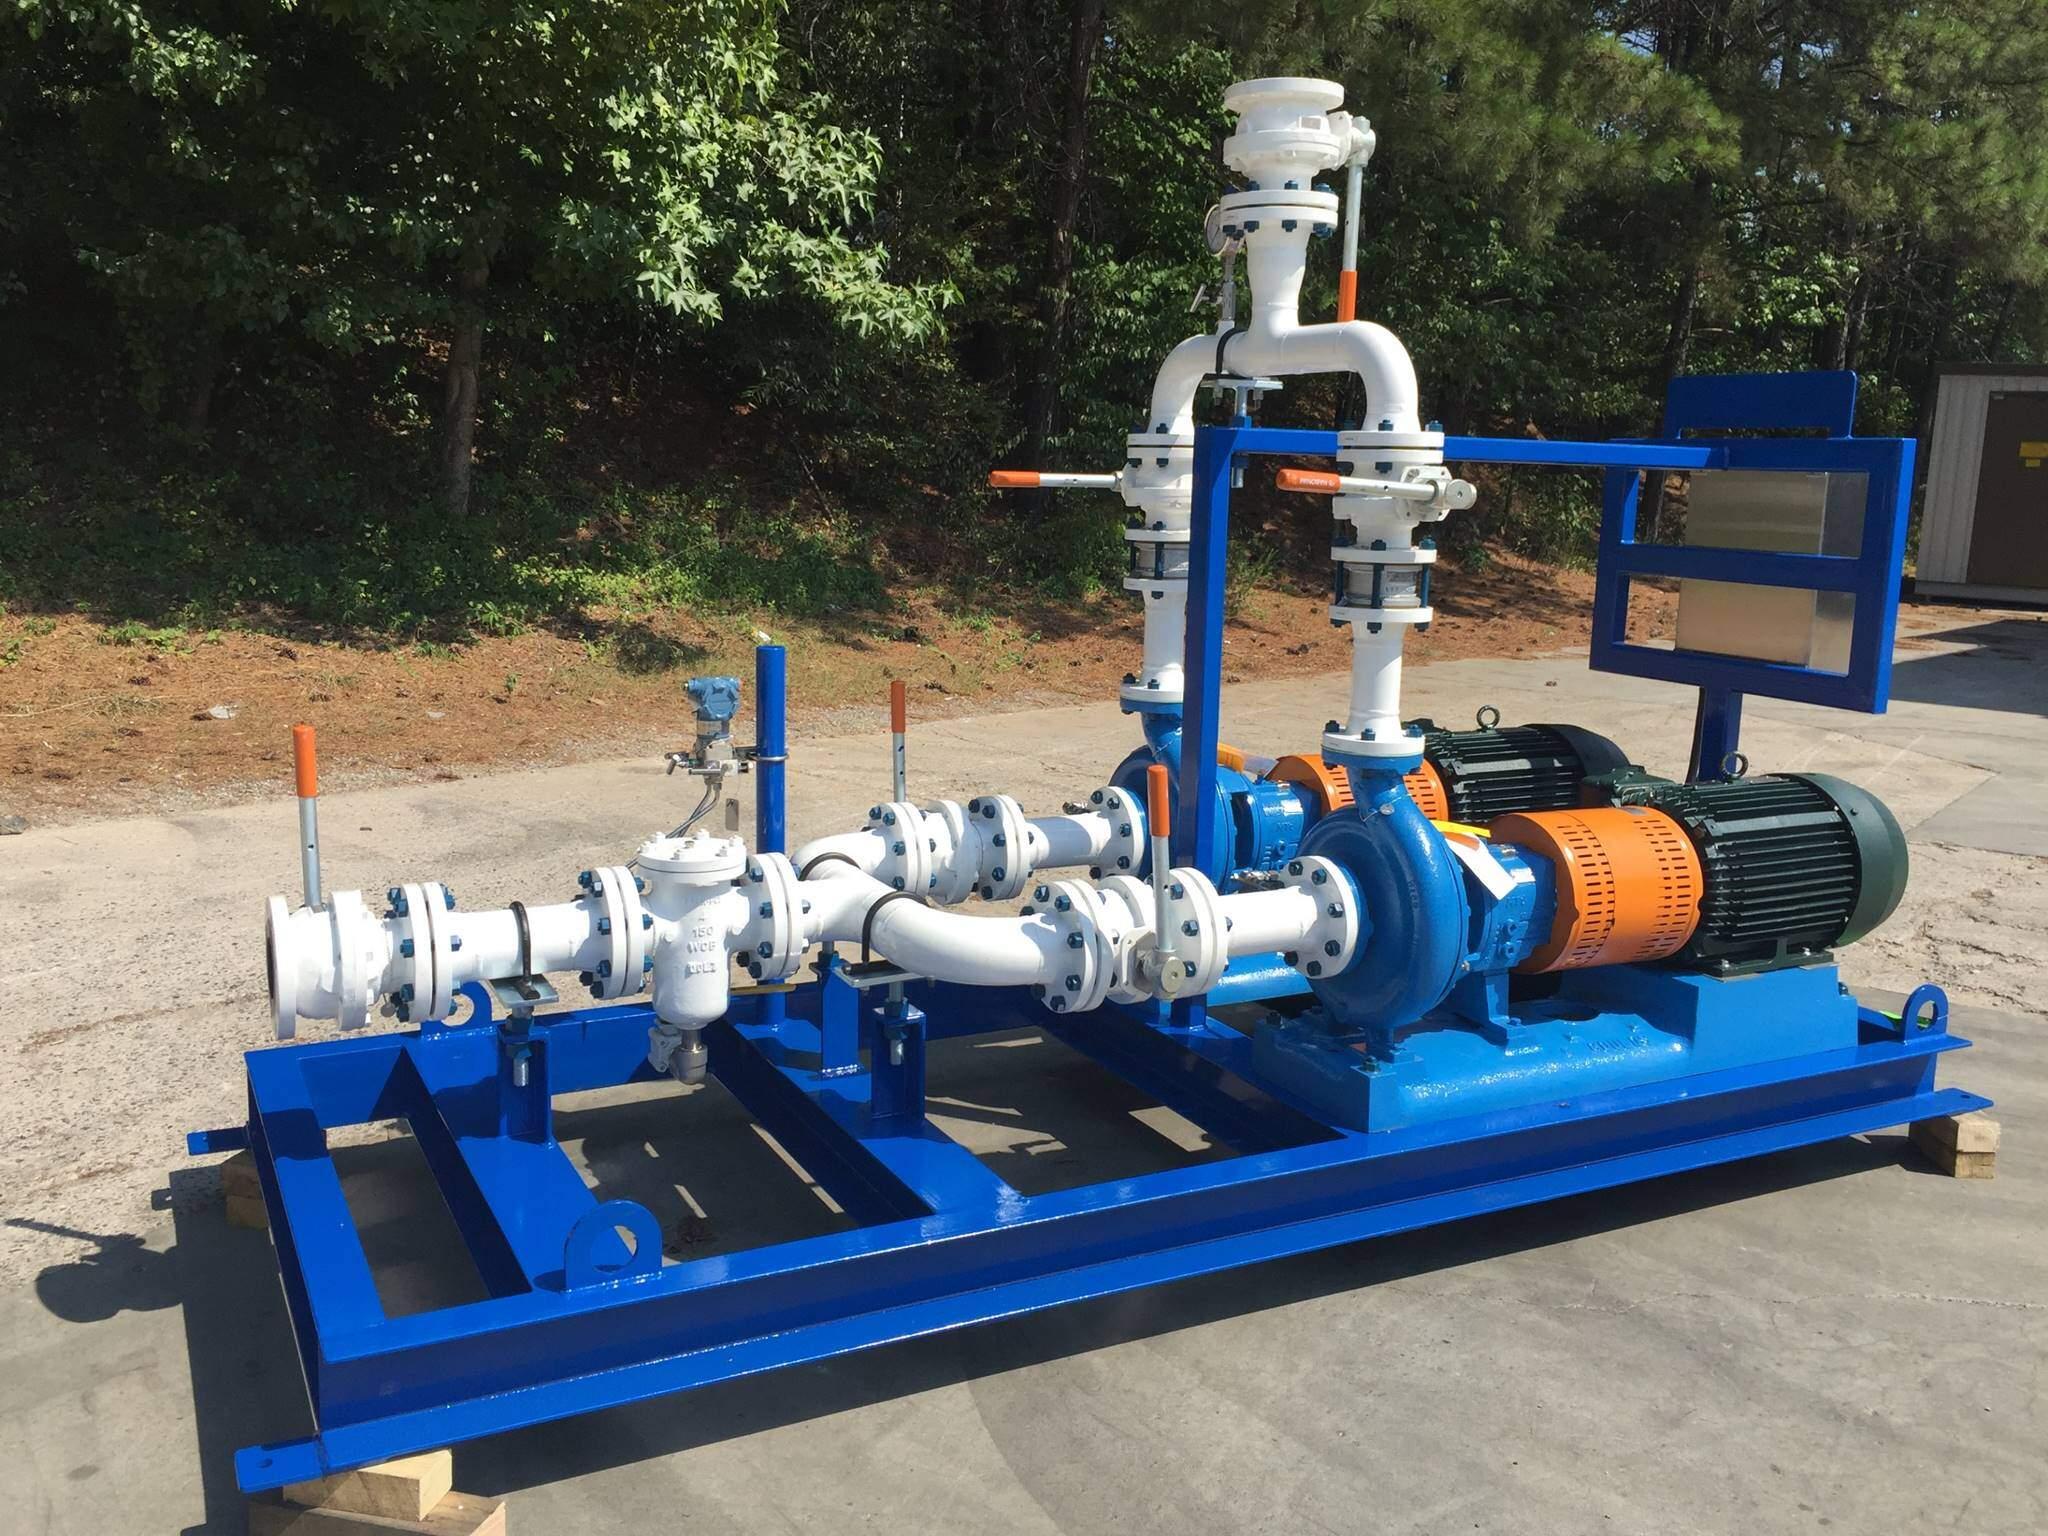 Packaged Pump Skid Systems - Pump Skid